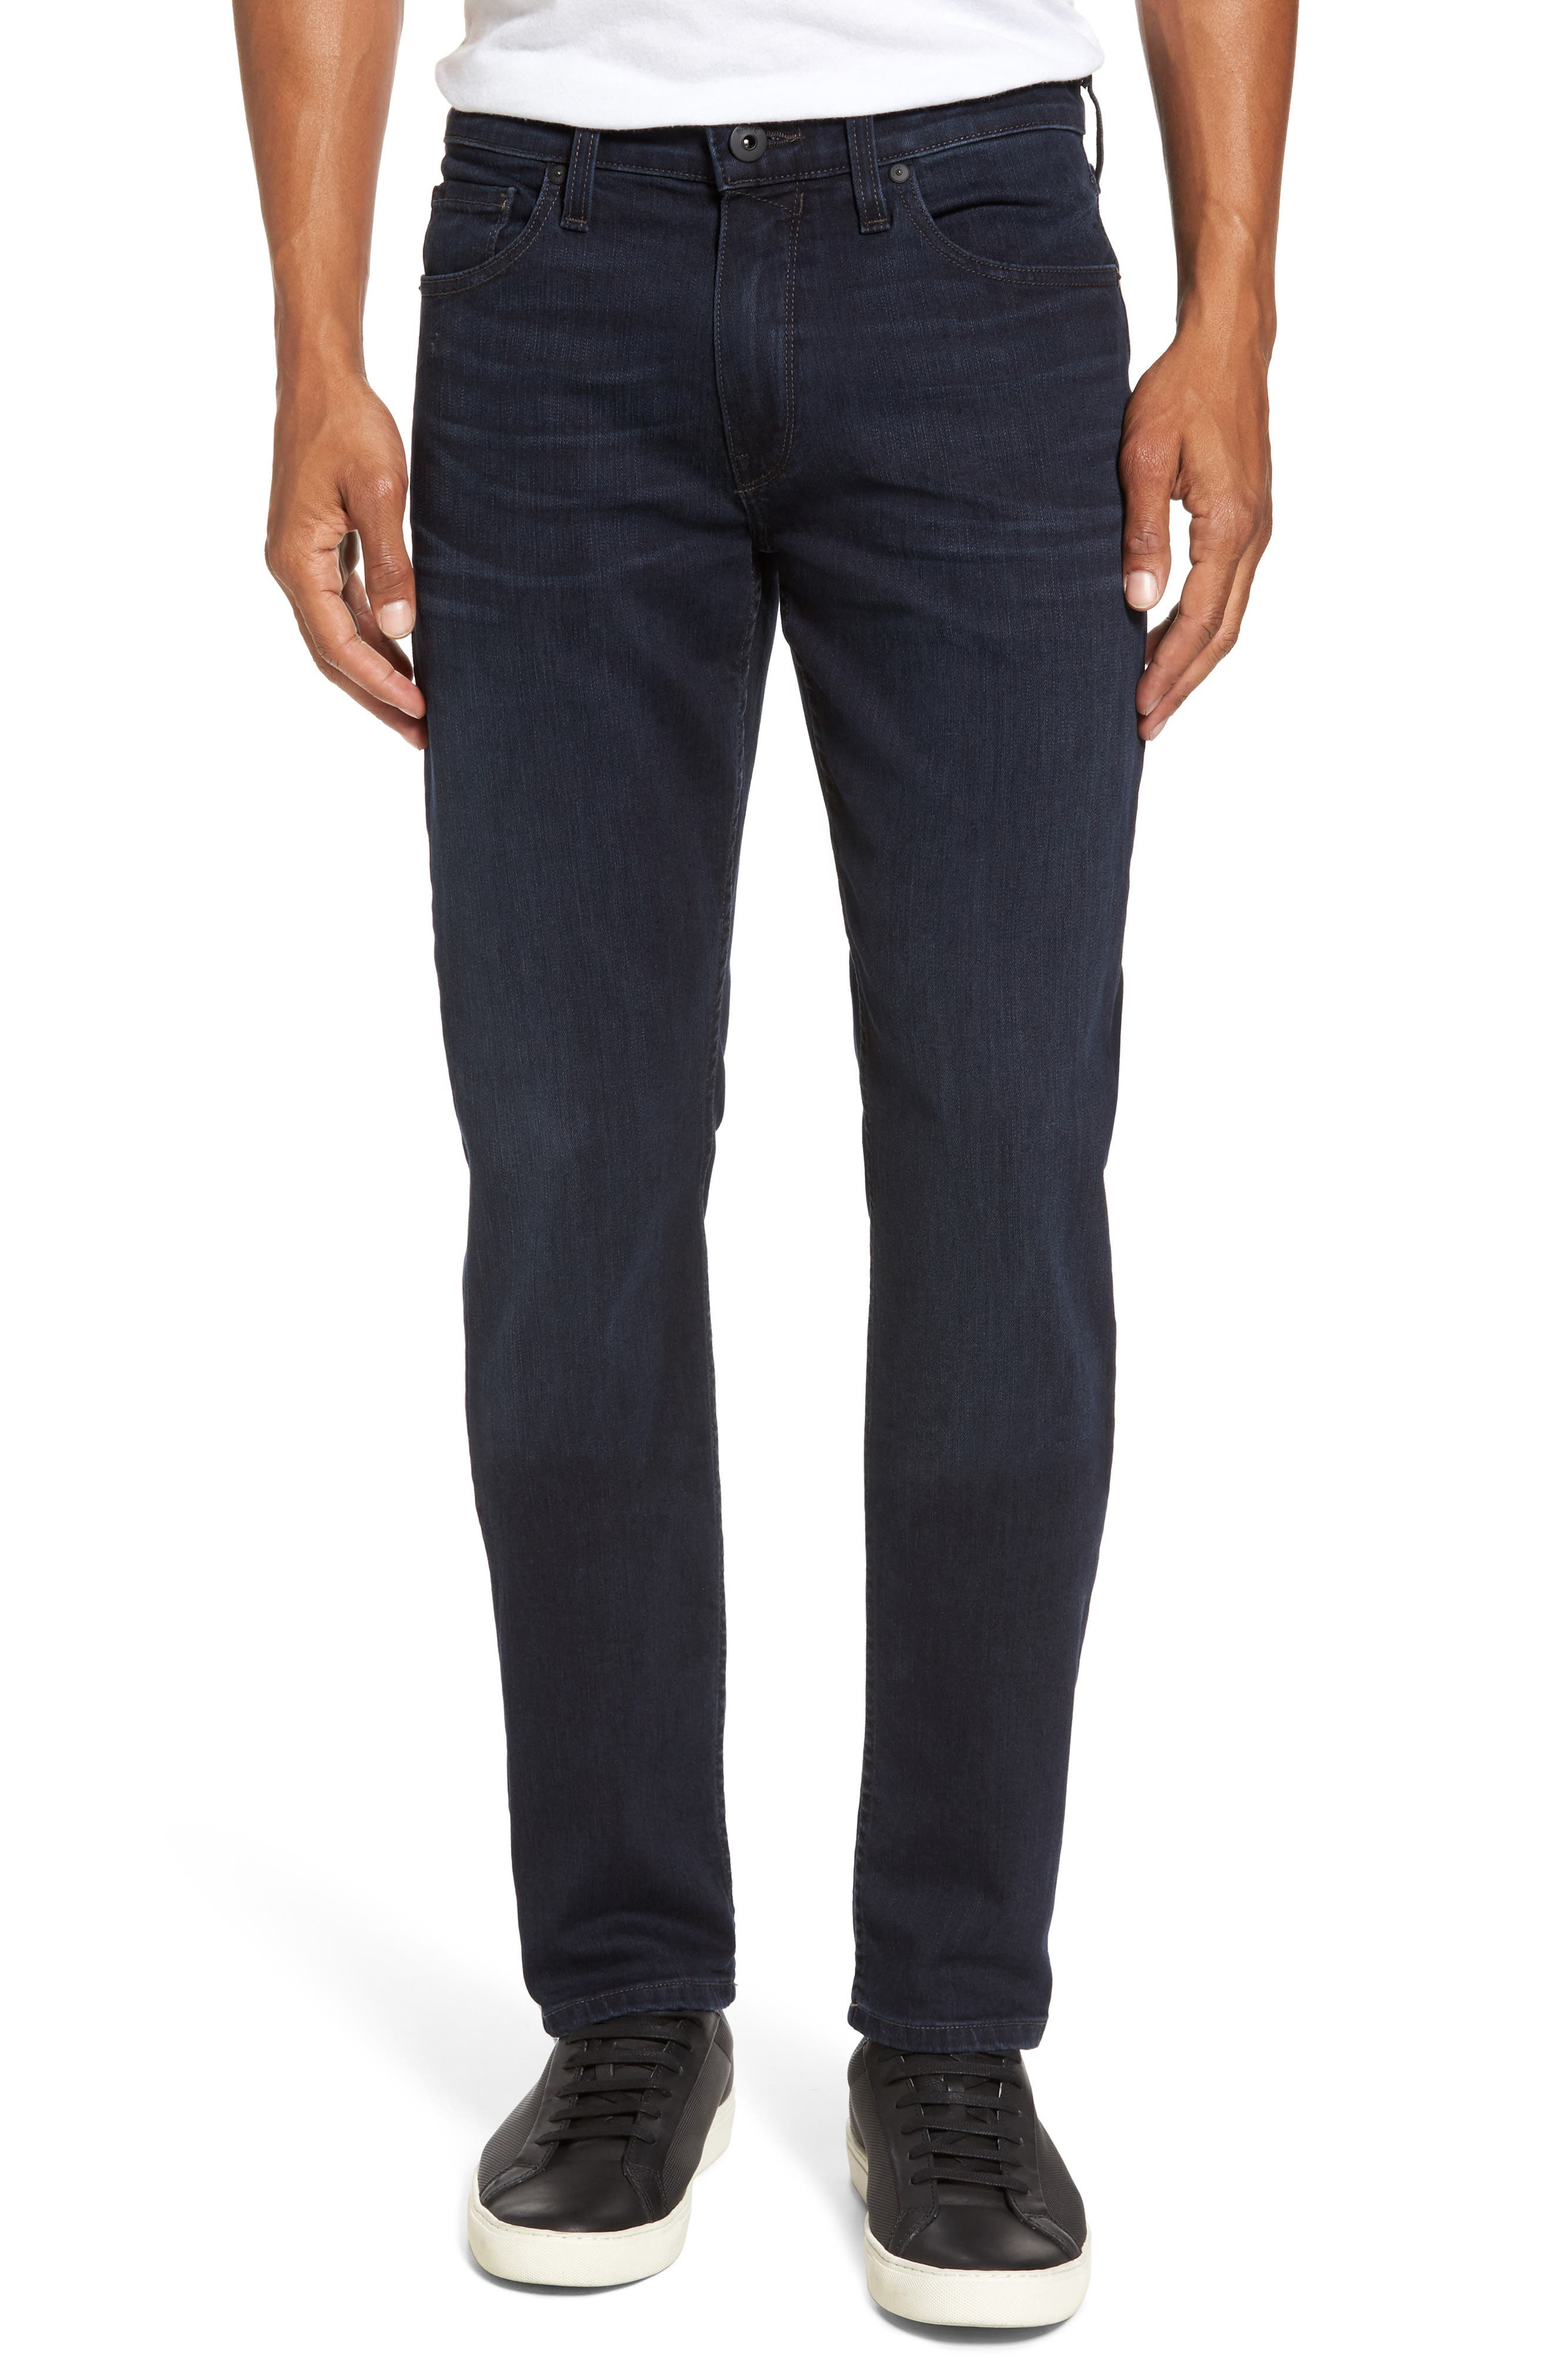 PAIGE Transcend - Lennox Slim Fit Jeans (Beckett)